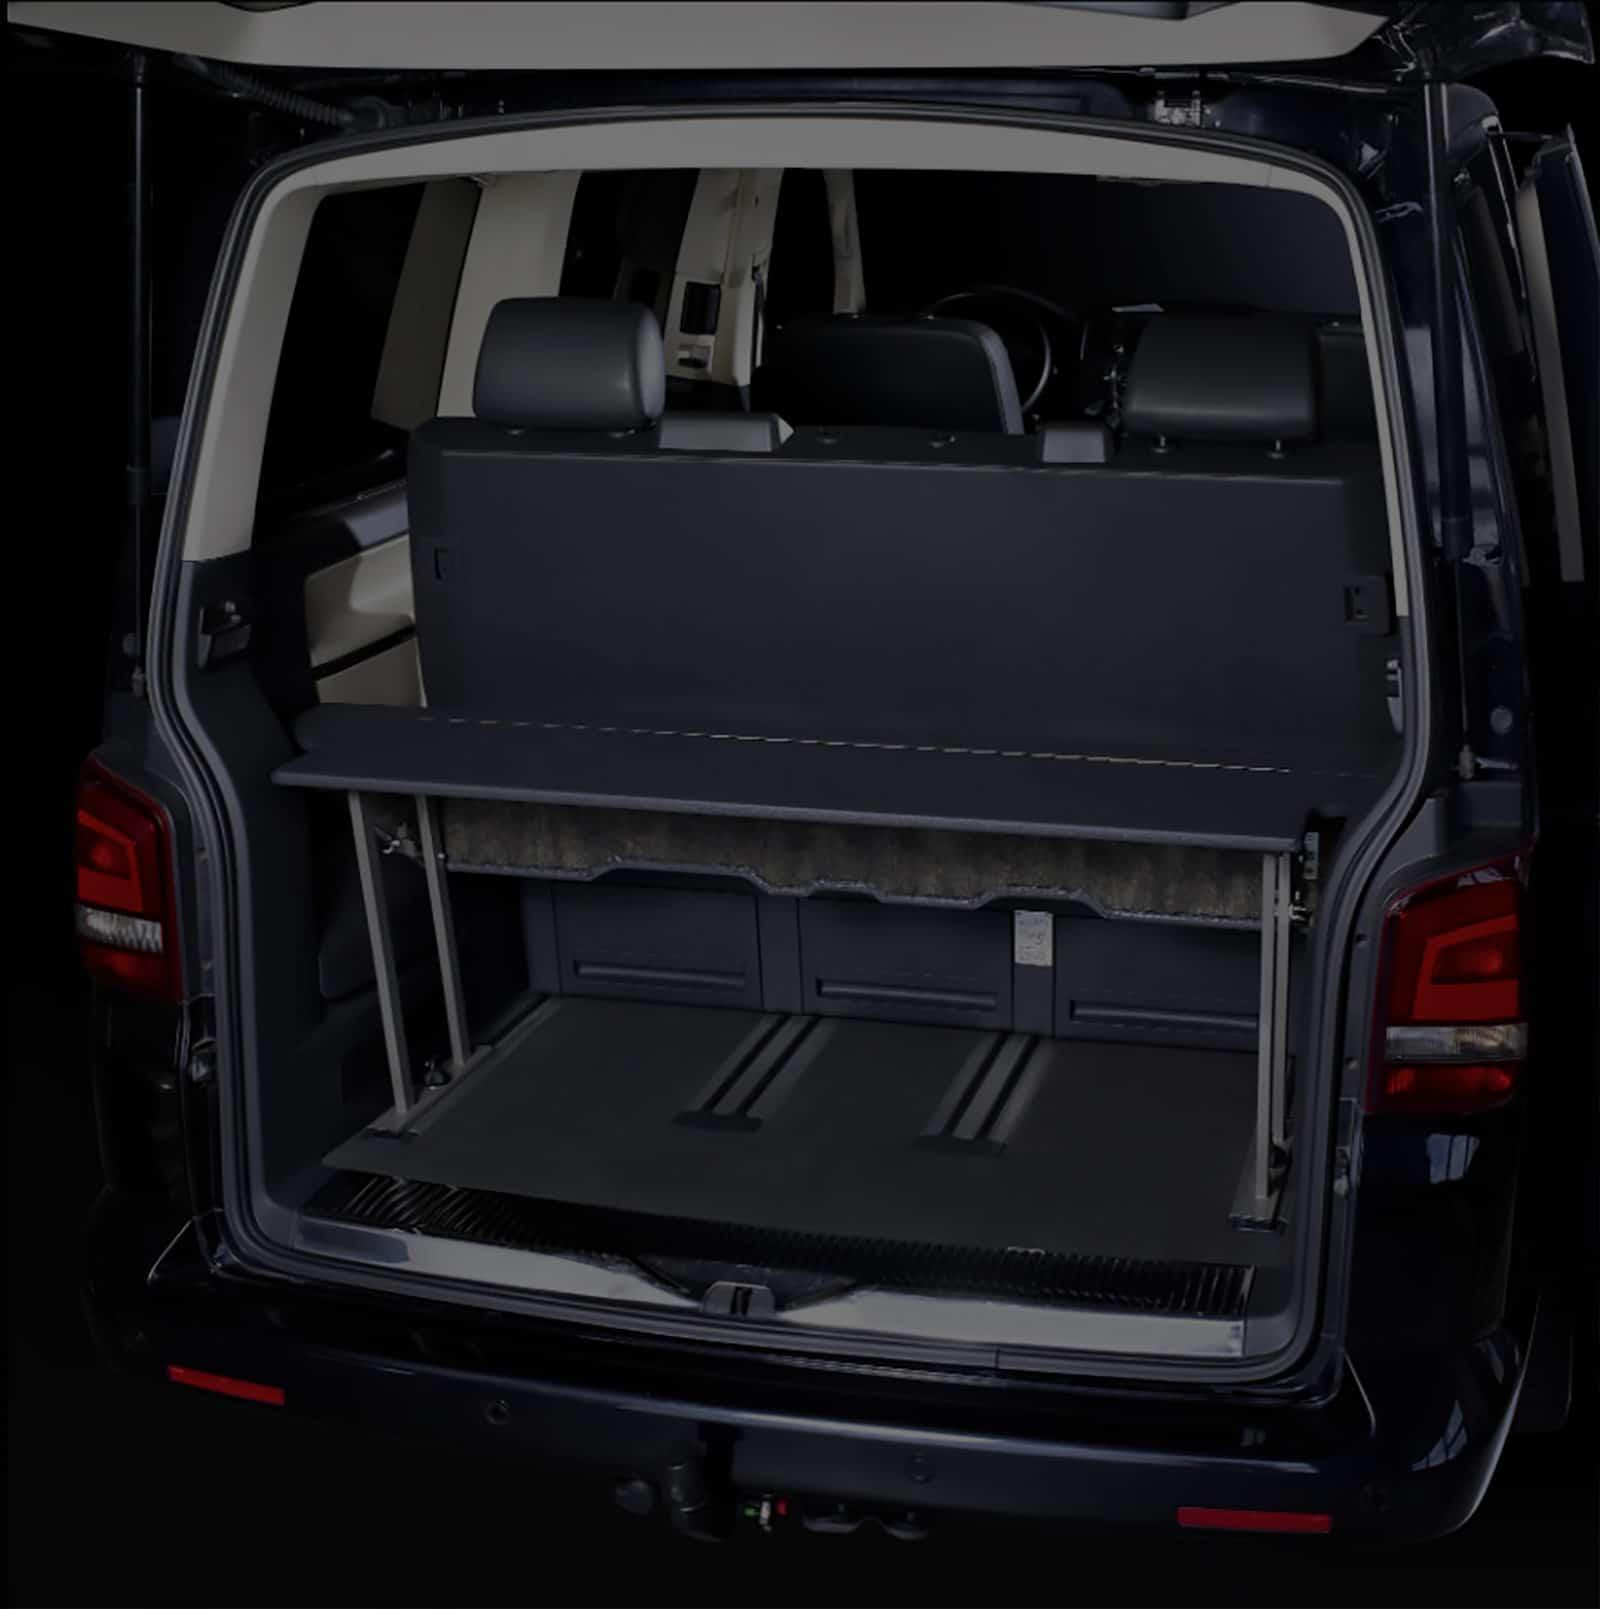 multiflexboard vw t5 t6 multivan viano gute nacht paket. Black Bedroom Furniture Sets. Home Design Ideas